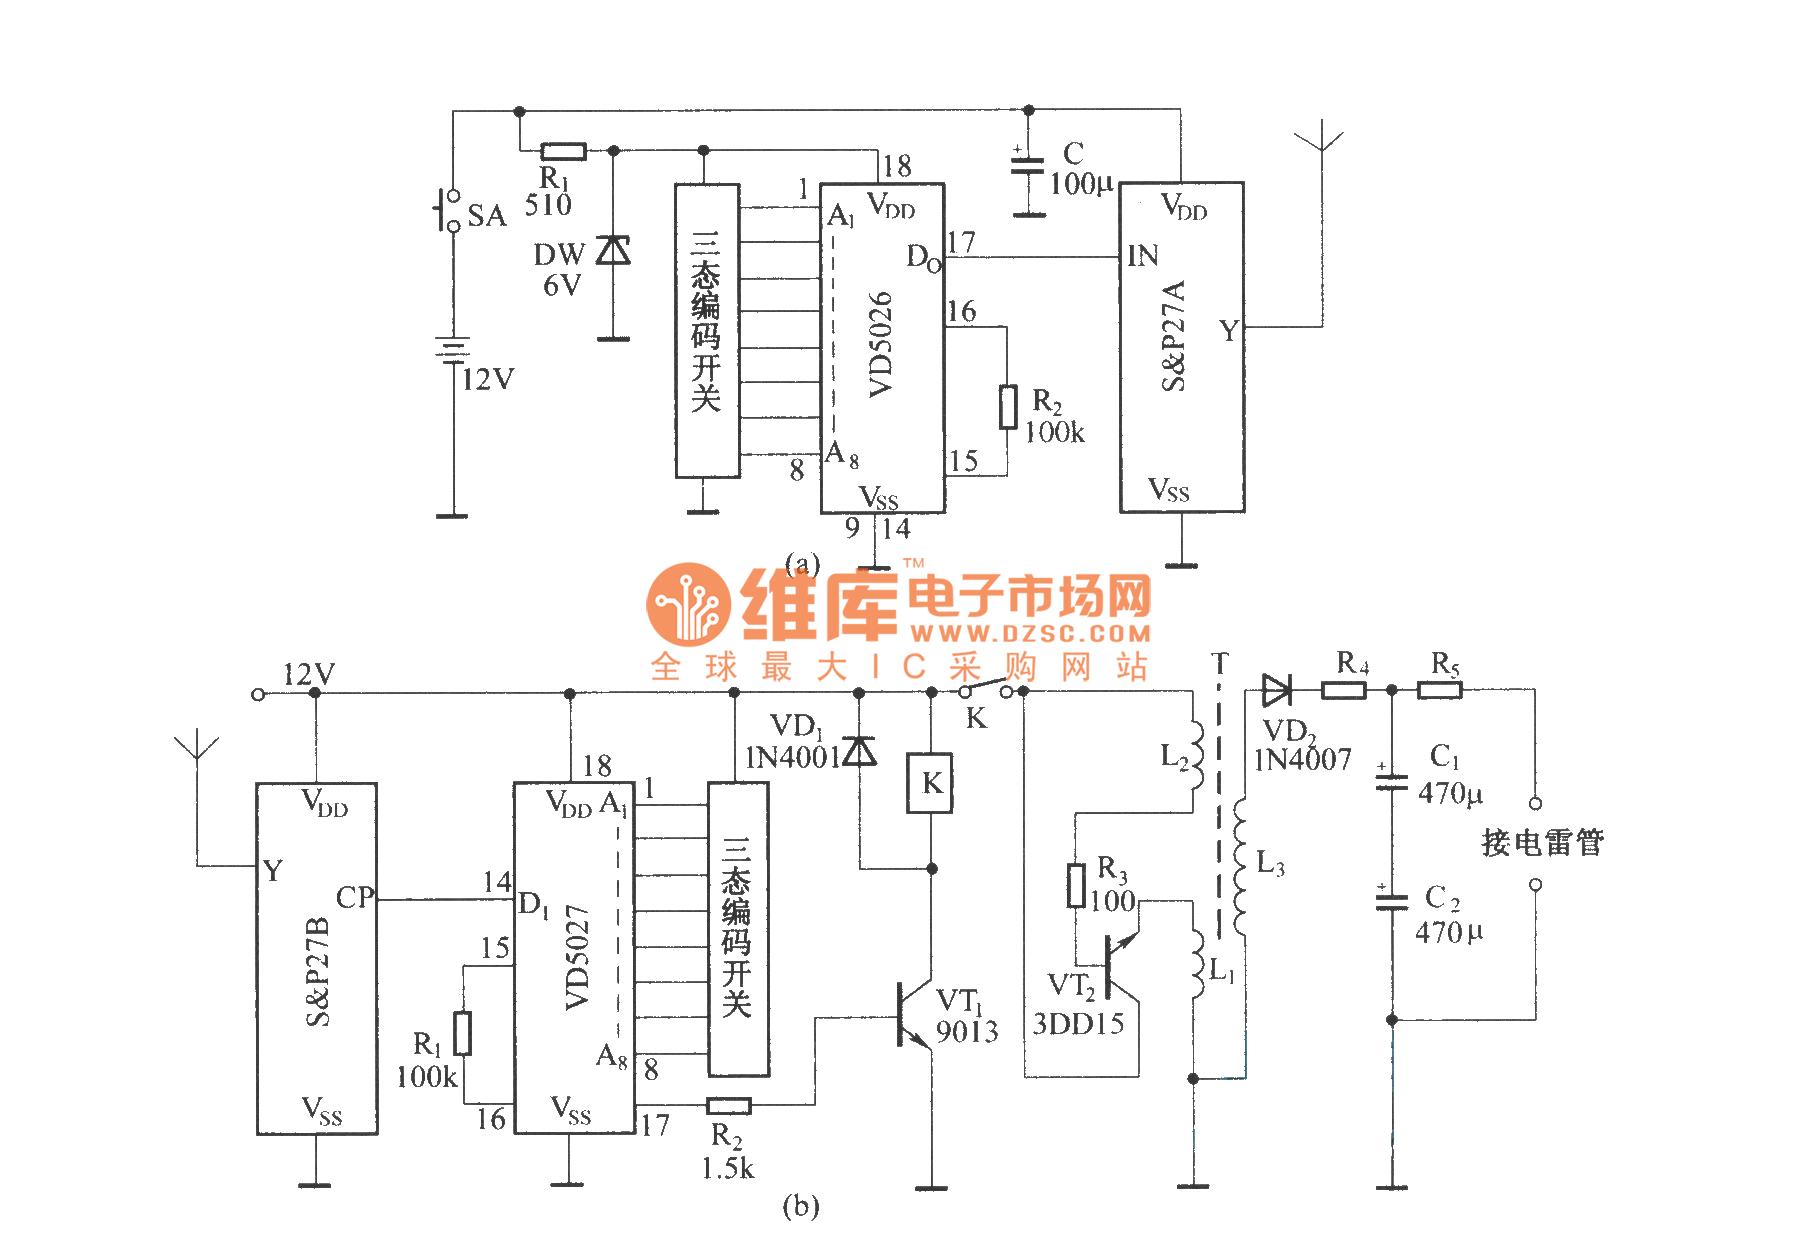 Composed Of Sp27a Sp27b Radio Controlled Explosive Device Circuit Orecg915dic Powersupplycircuit Diagram Seekiccom